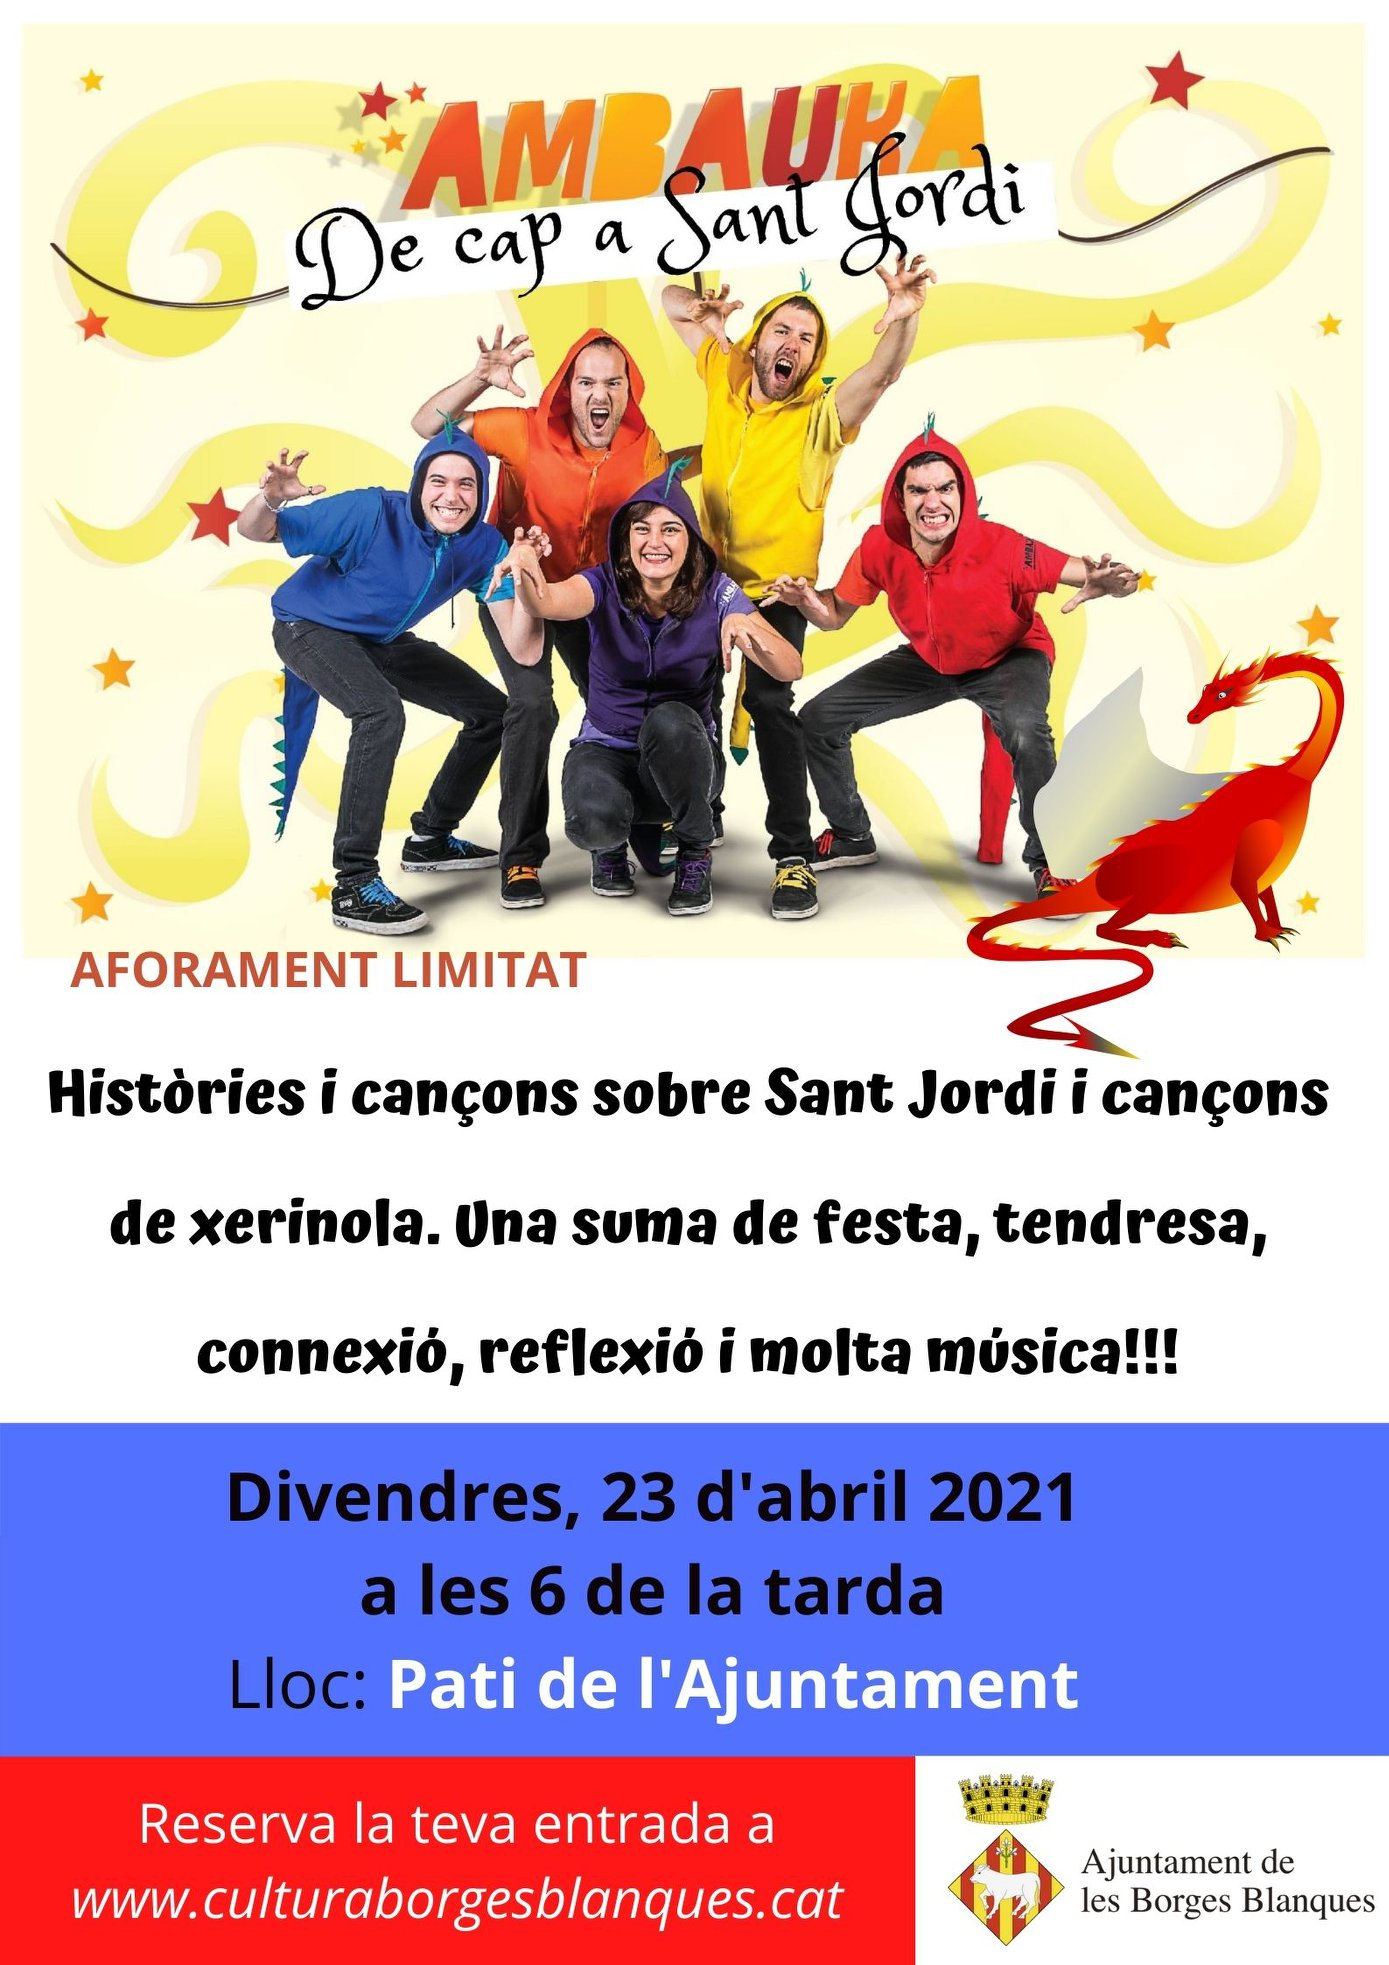 Les Borges prepara un espectacle musical infantil per celebrar aquest Sant Jordi 2021